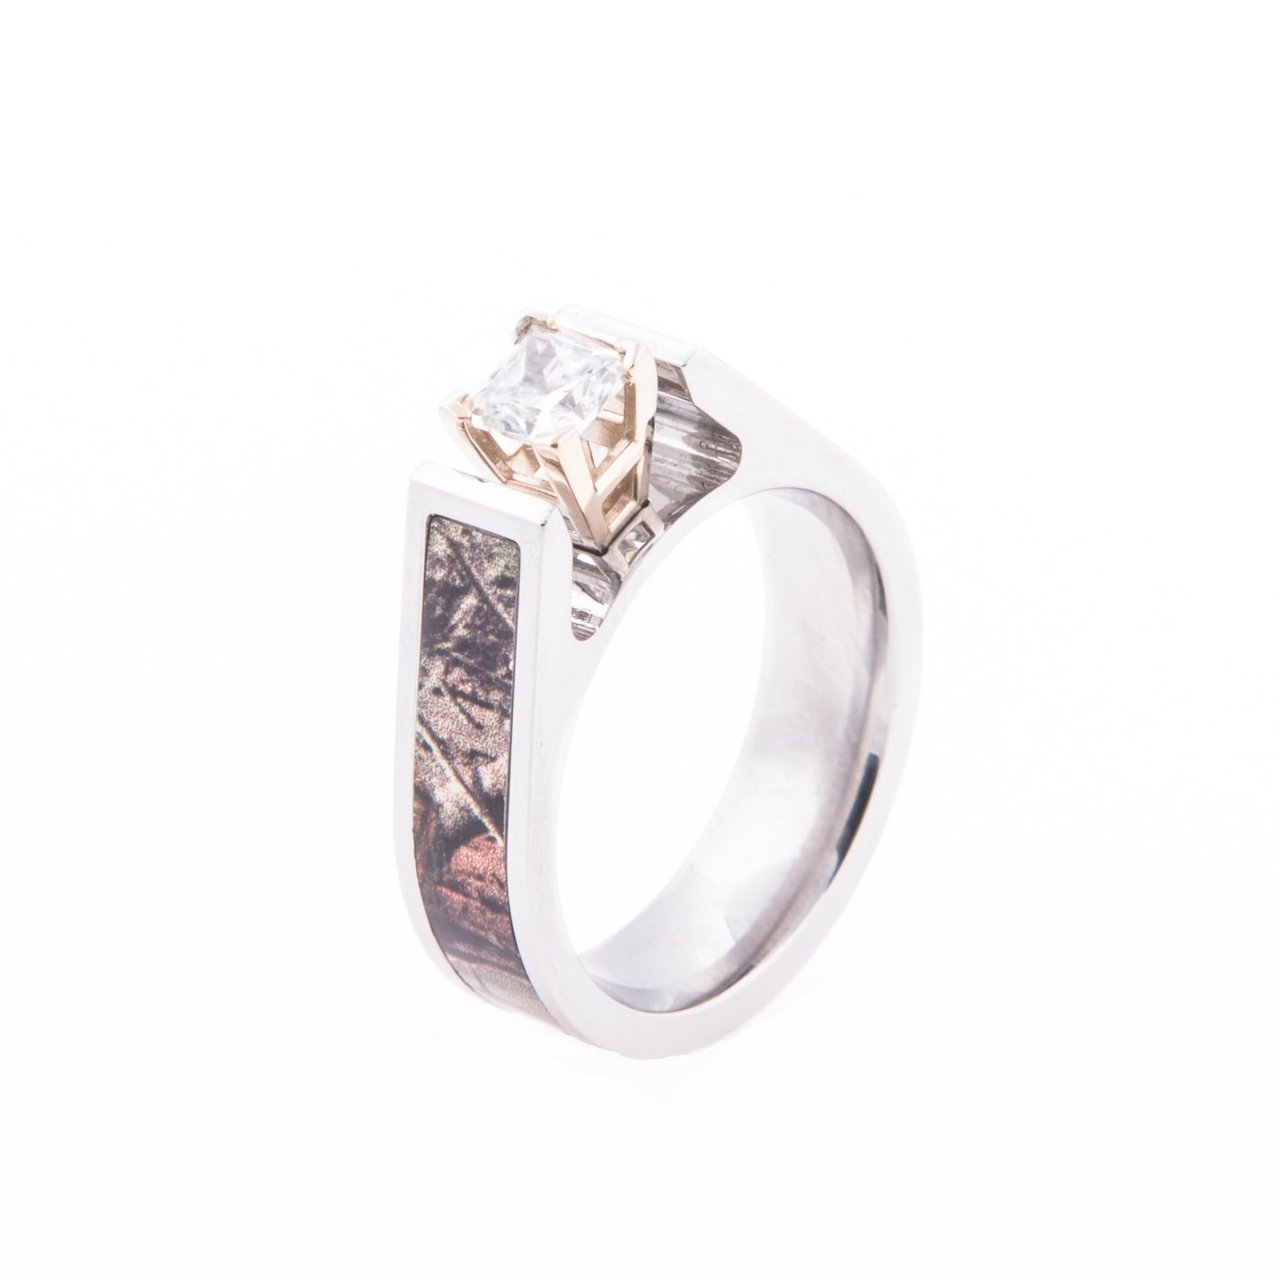 camo engagement wedding ring womens camo wedding rings Women s Cobalt Chrome Cathedral Cut Diamond Camo Engagement Band